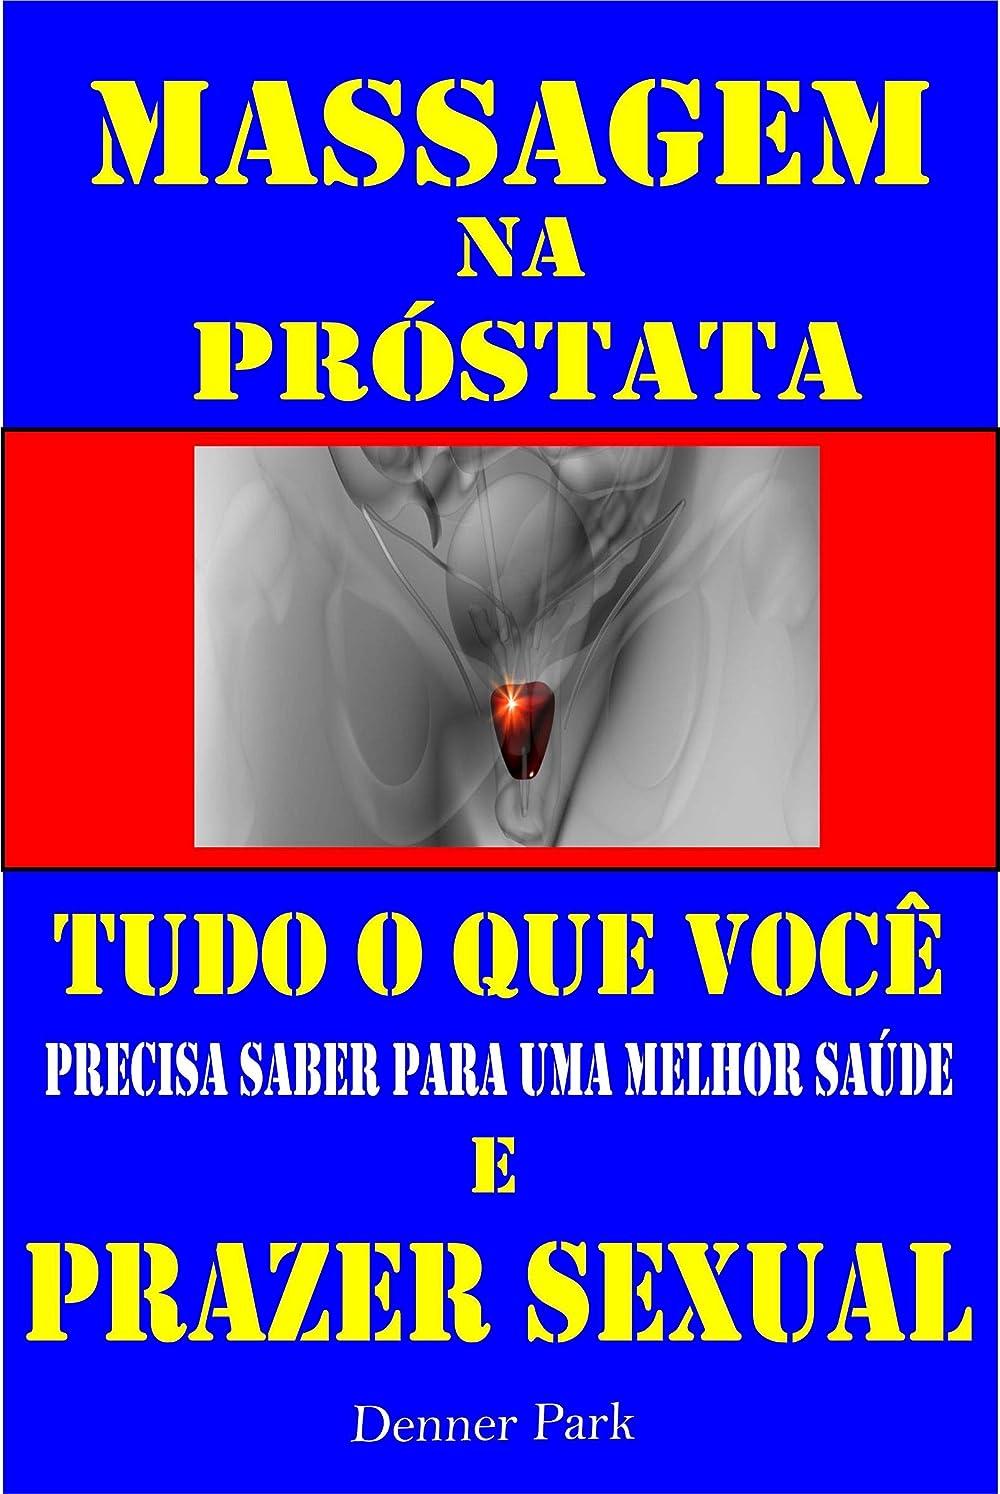 権利を与える虚栄心騒々しいMassagem na Próstata Tudo que Você Precisa Saber para uma Melhor Saúde e Prazer Sexual: Aprenda a ter Orgasmos Poderosos na hora do Sexo (Portuguese Edition)